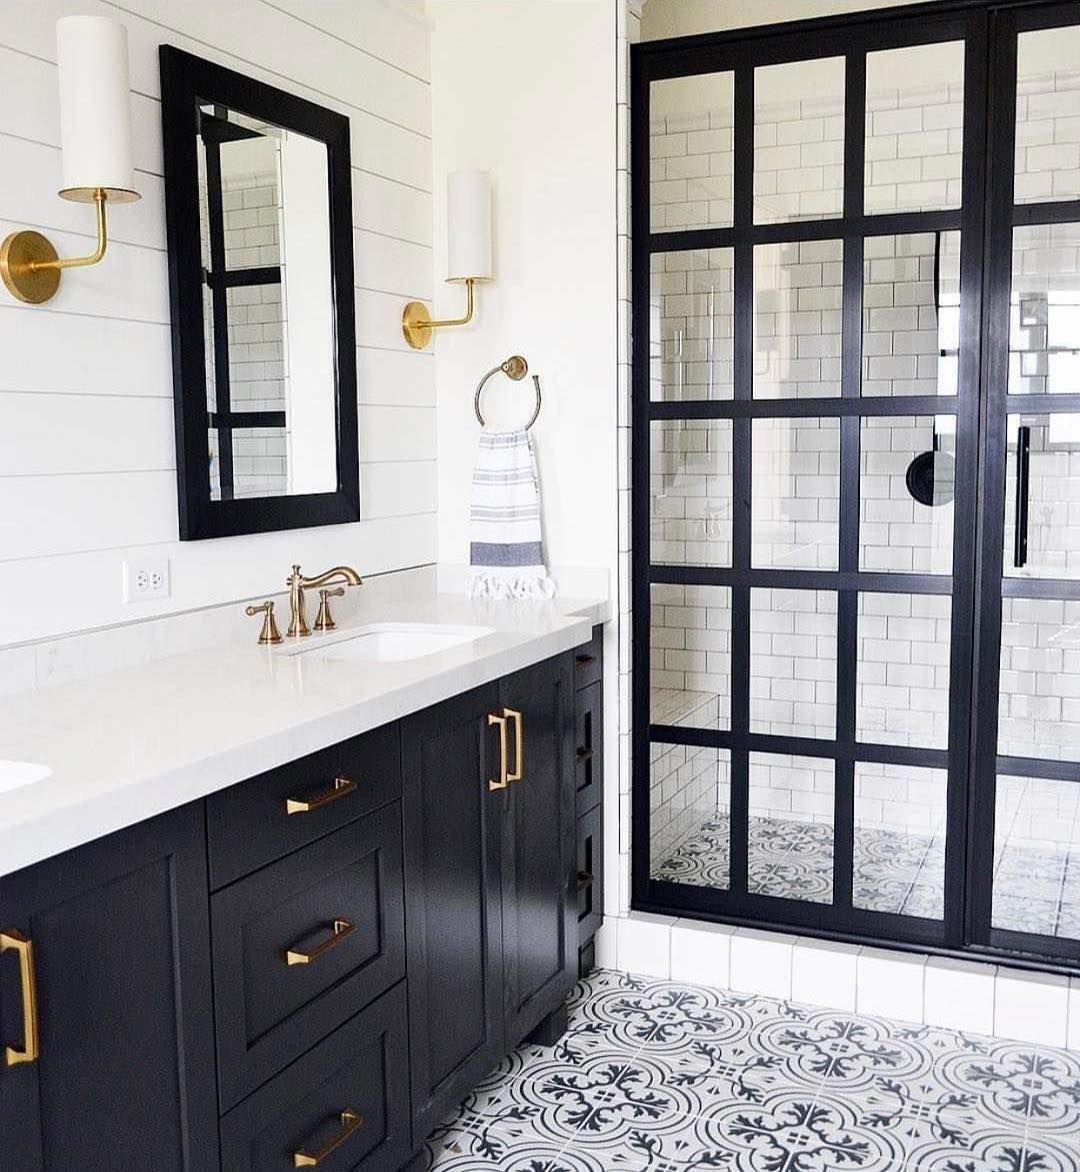 Modern Farmhouse Bathroom With Black Framed Shower Door Vanity Brass Fixtures Shiplap Paneled Wall And Cement Floor Tile Screen